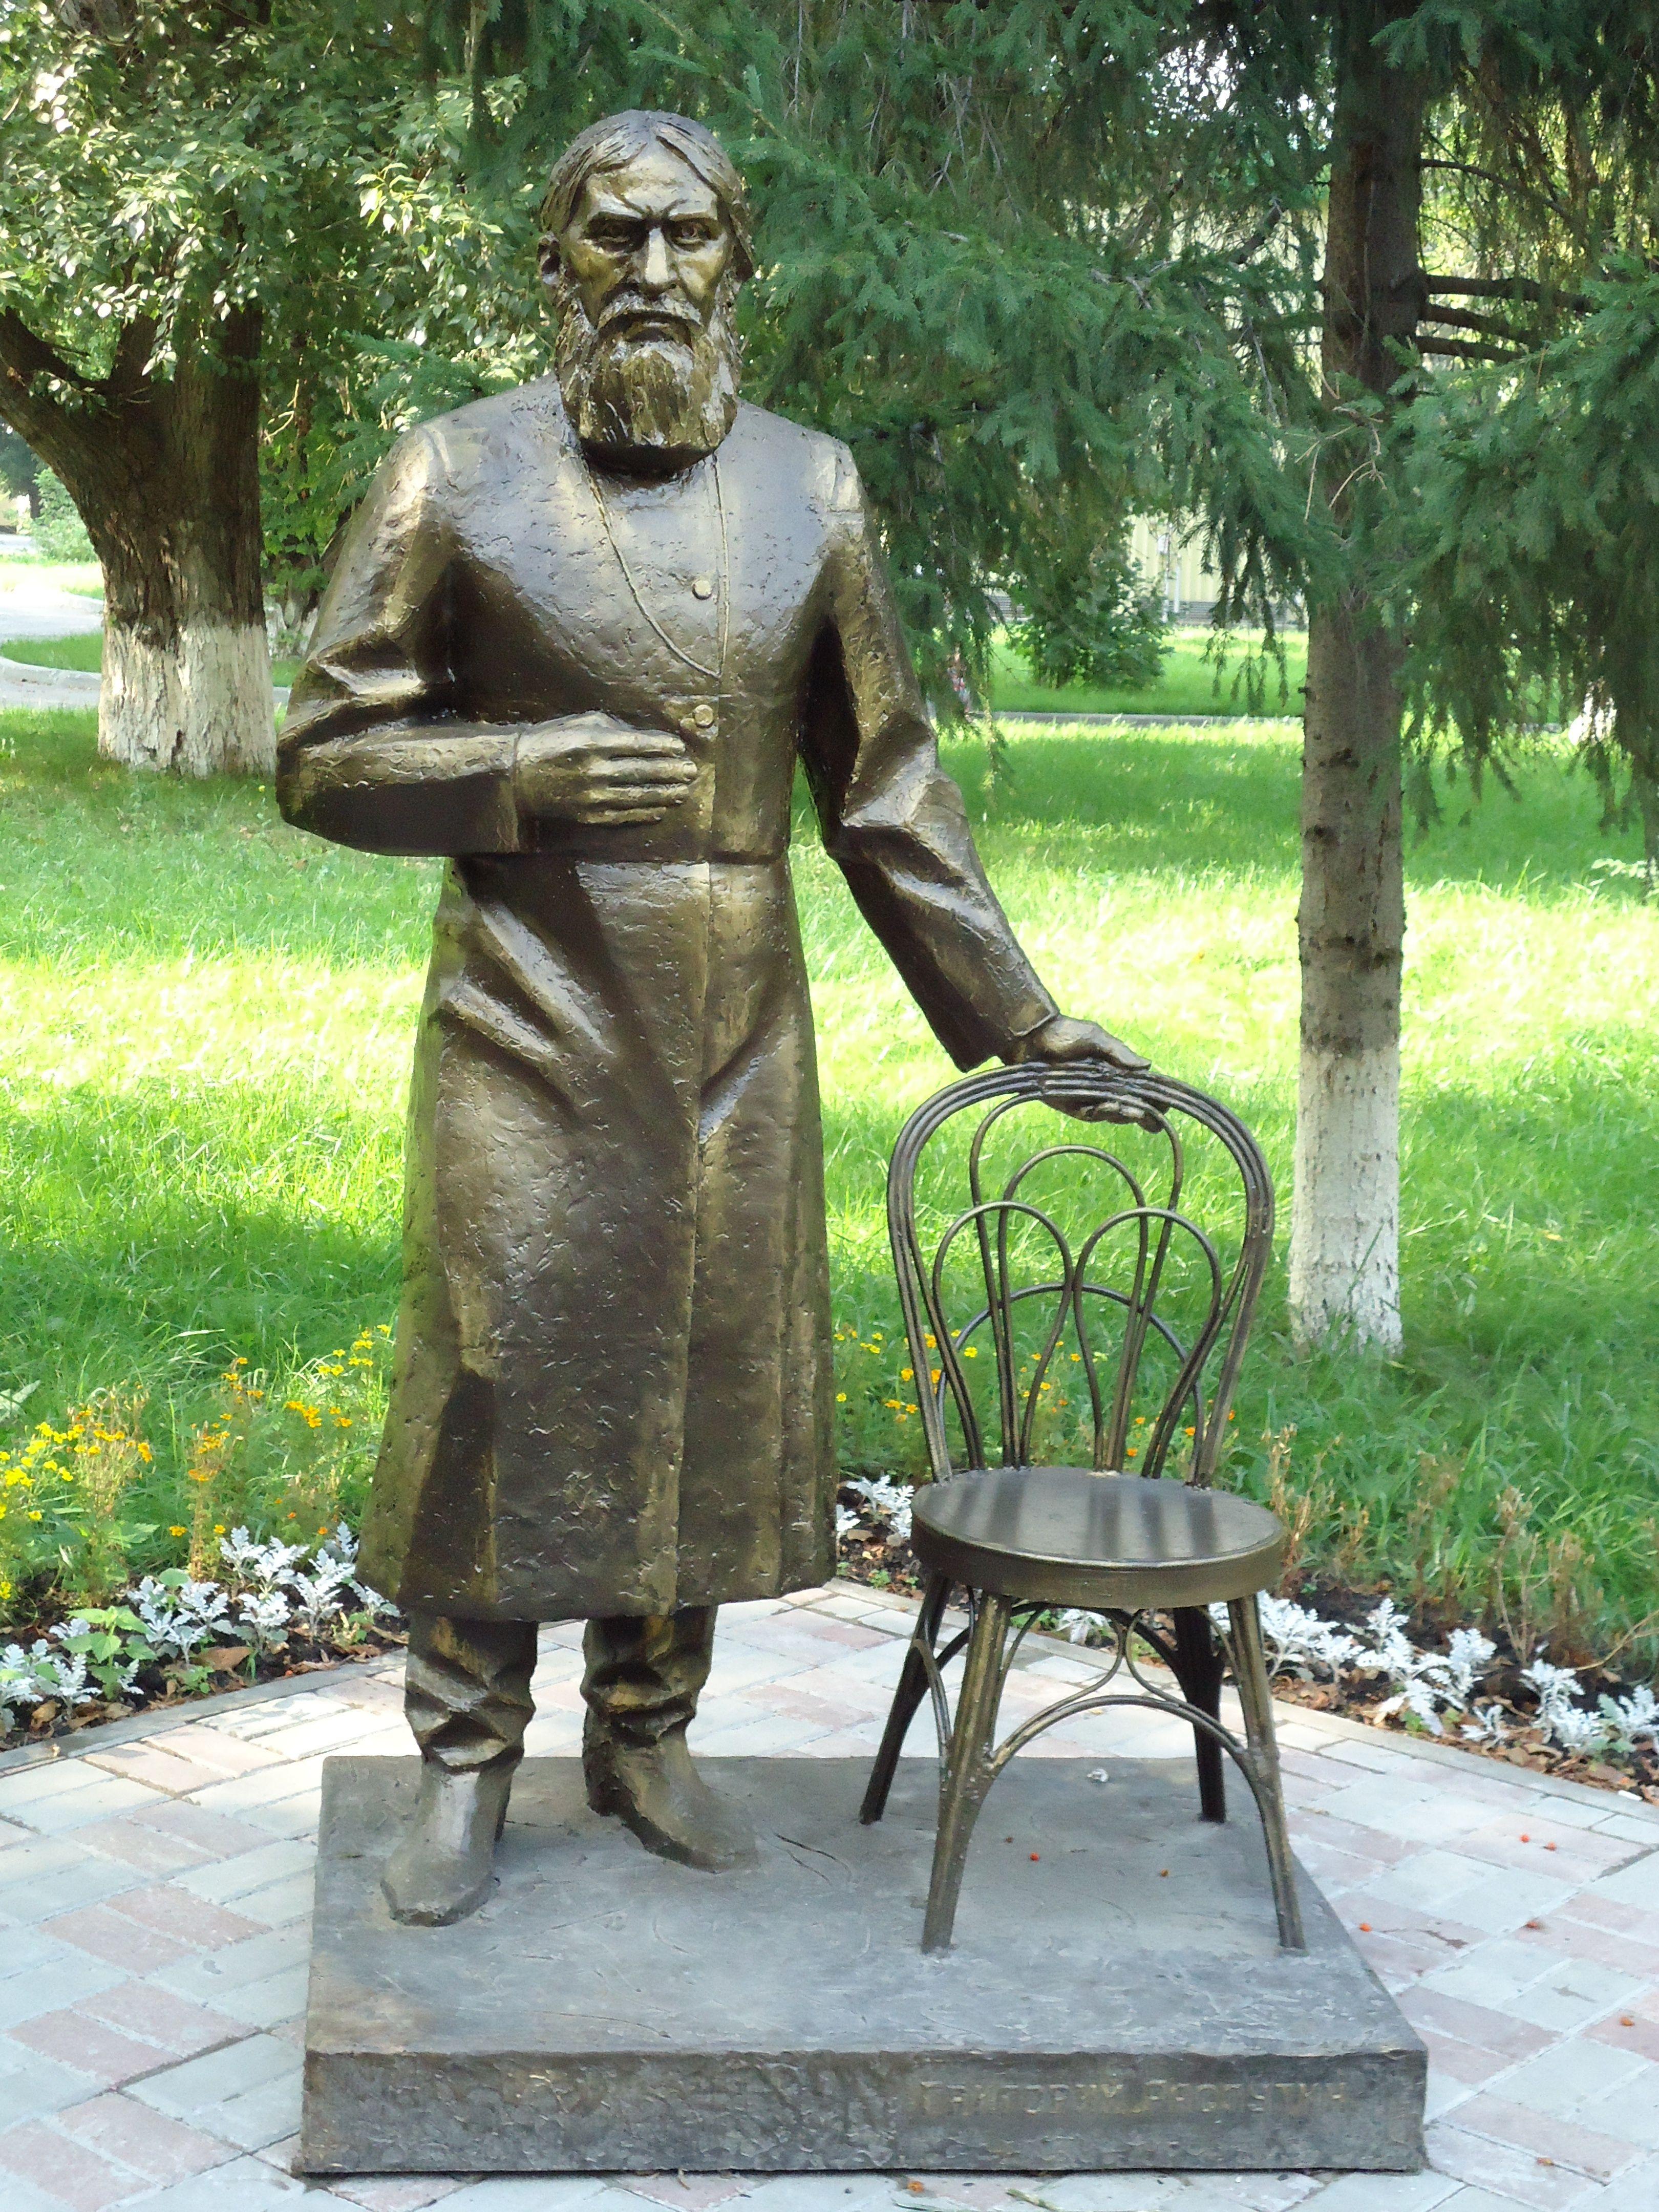 Григорий Распутин Grigorii Rasputin   Memorials   Pinterest   Skulptur